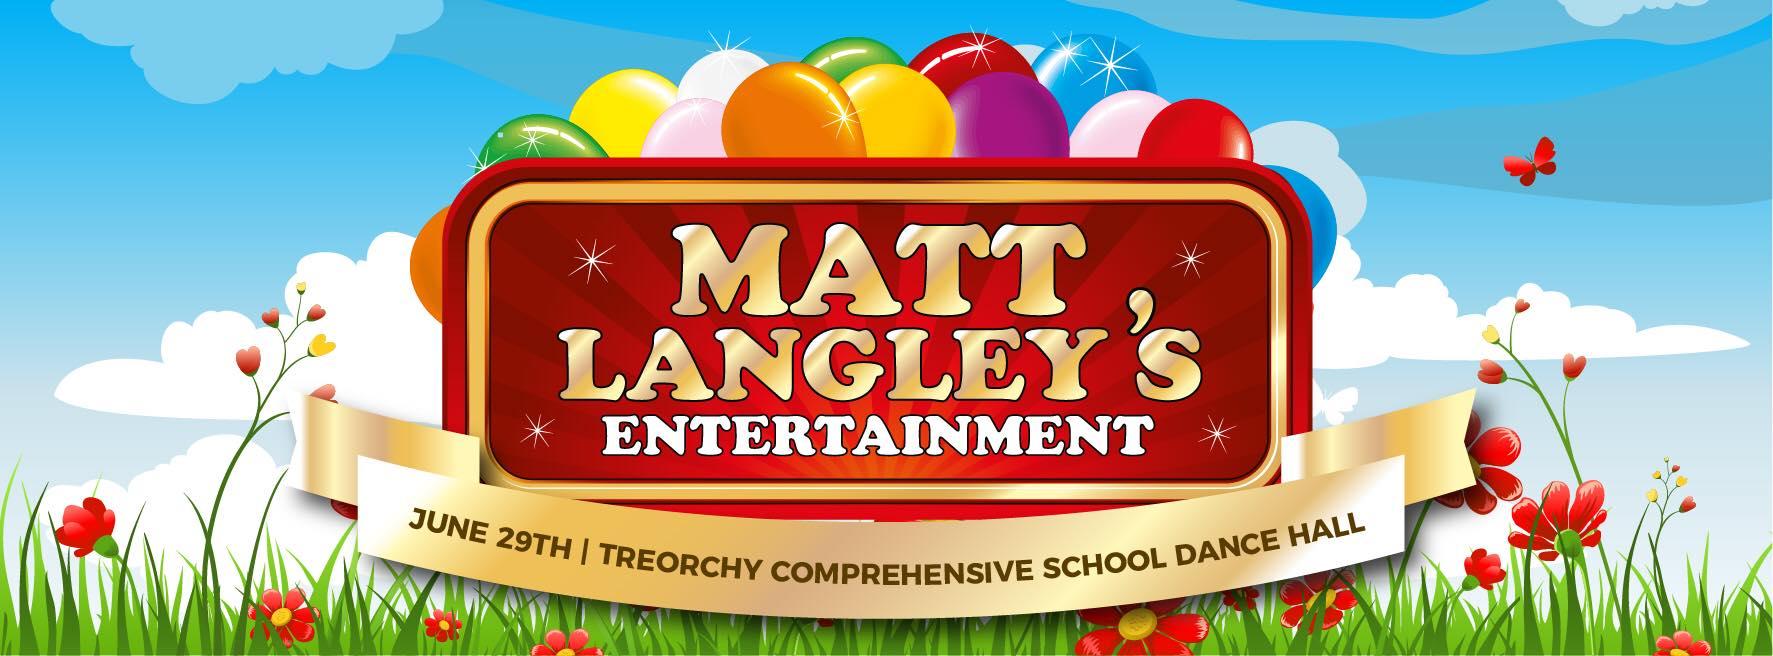 "Matt Langley's Entertainment- ""Family Fun Day"" for Rhondda Arts Festival Treorchy (RAFT) banner image"